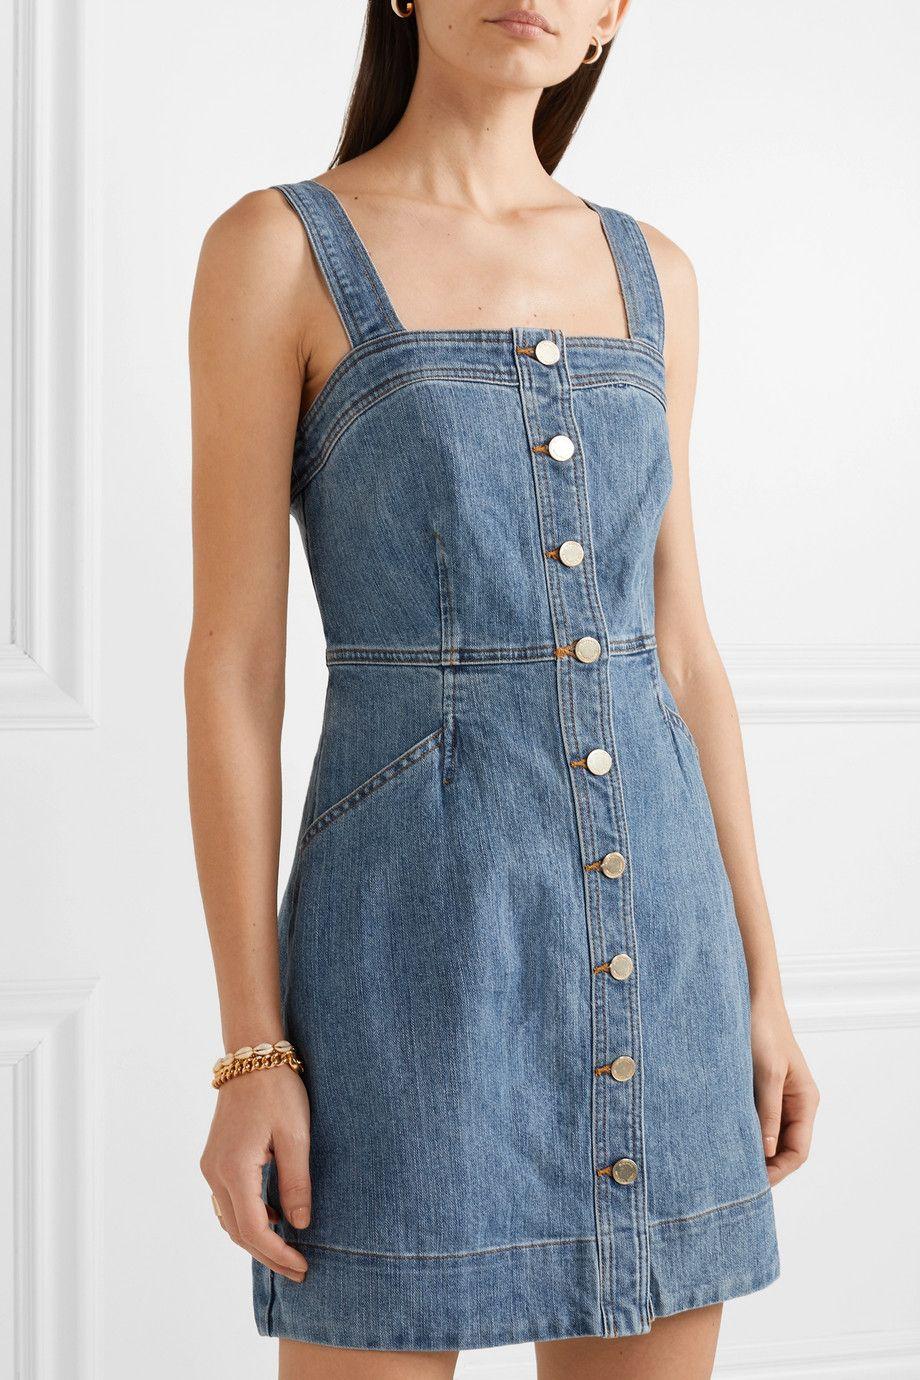 Michael Michael Kors Denim Mini Dress Net A Porter Com Denim Mini Dress Mini Dress Casual Clothes [ 1380 x 920 Pixel ]